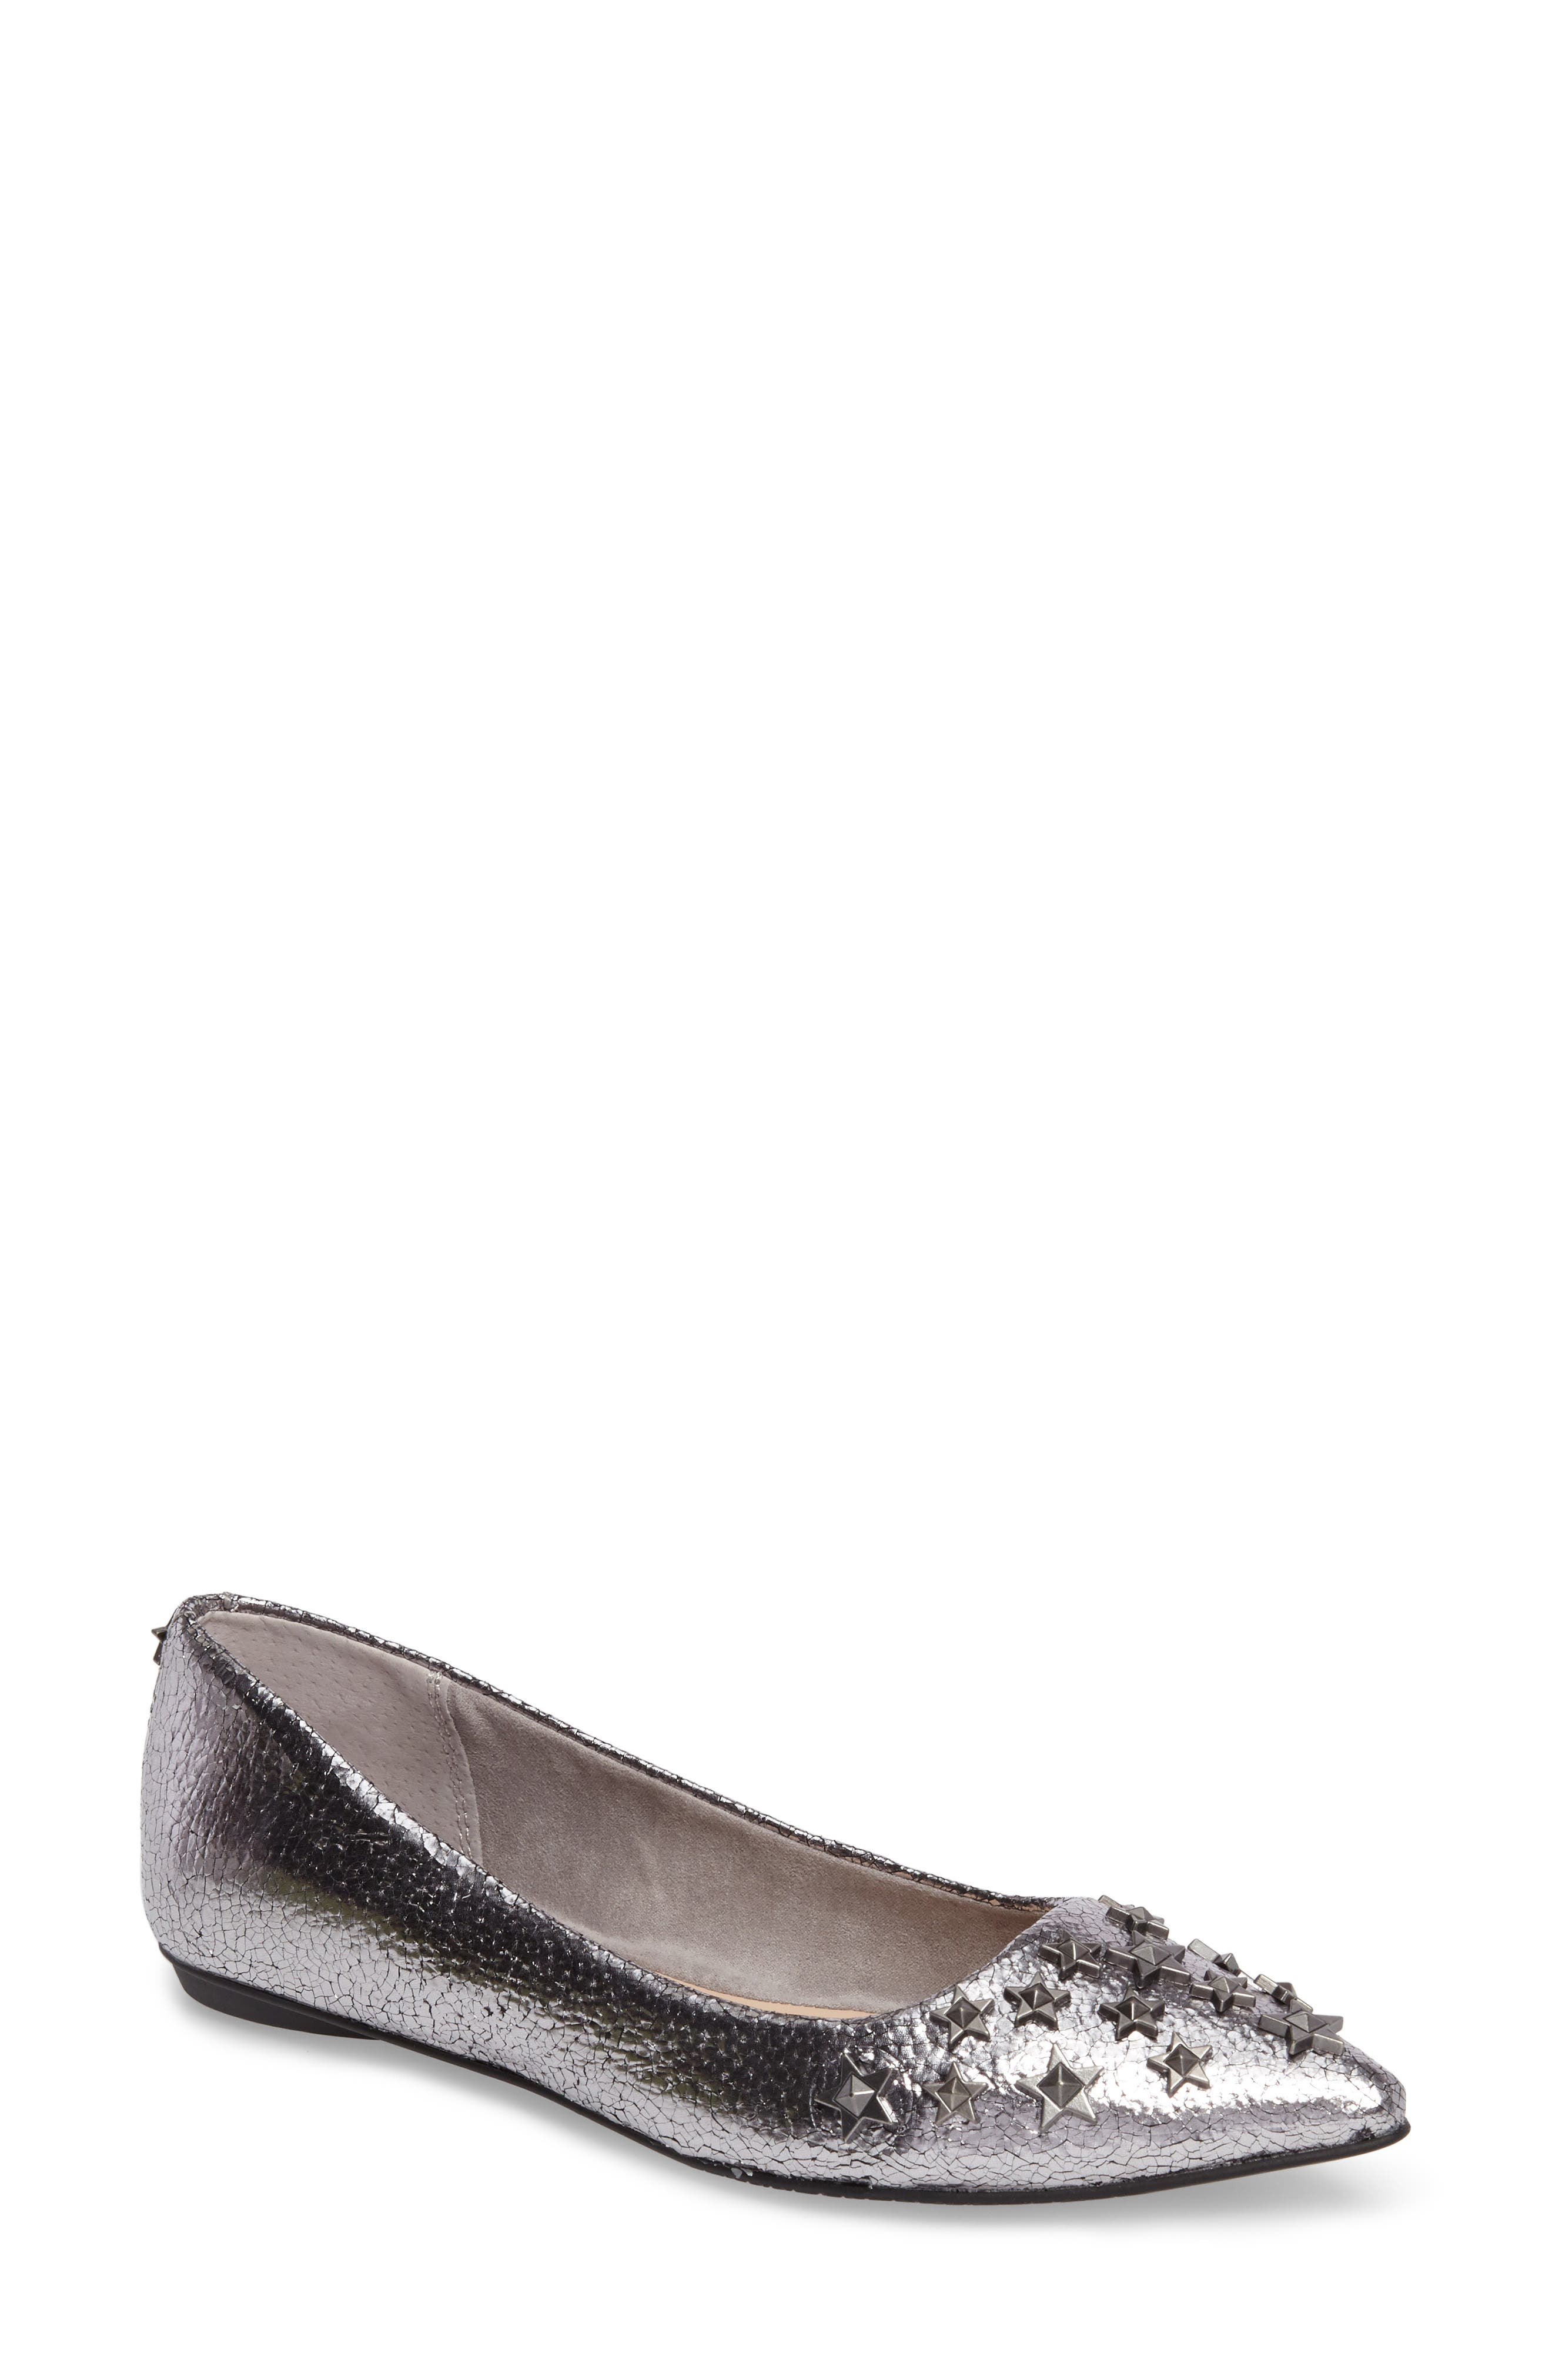 Alternate Image 1 Selected - BP. Stella Embellished Flat (Women)